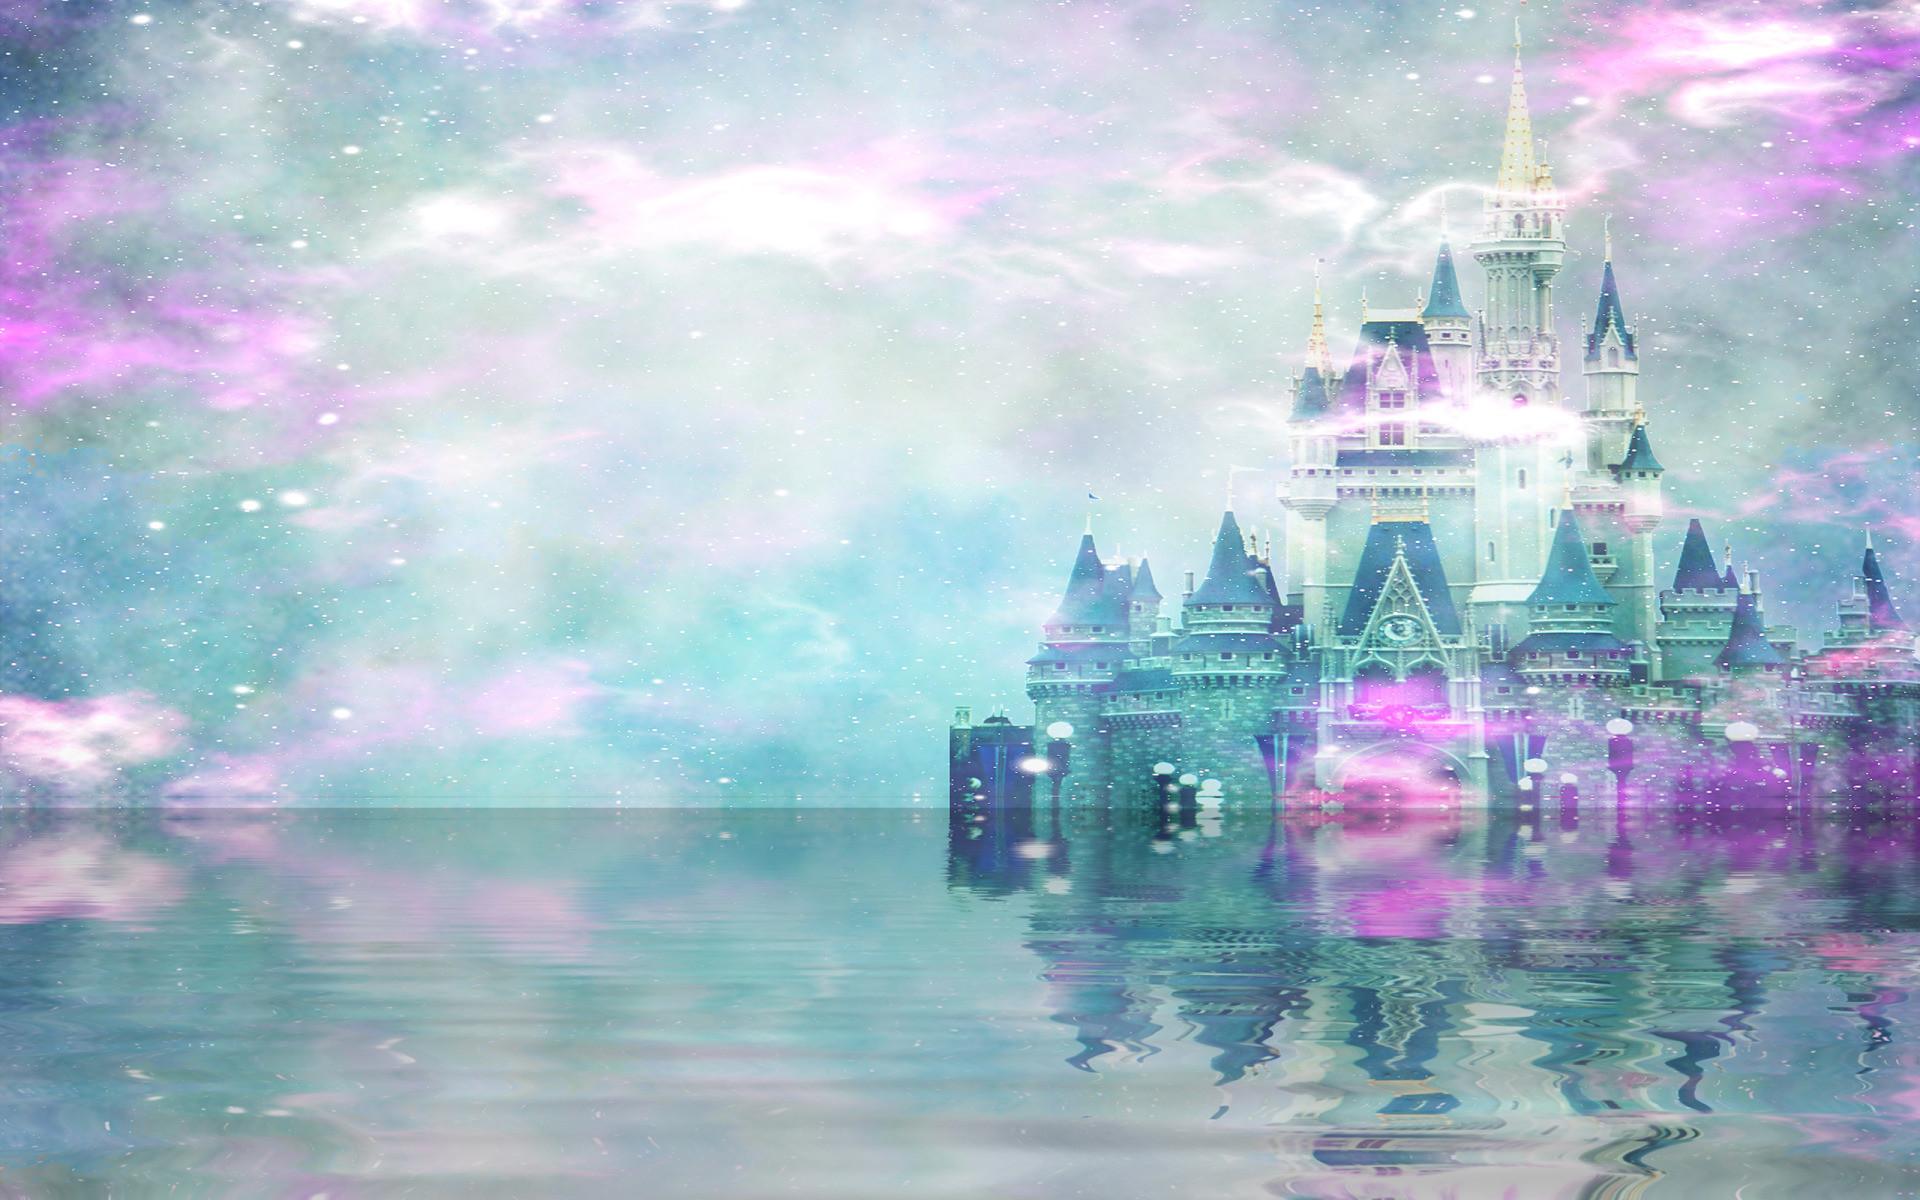 Princess Castle HD Wallpaper 1080p #d25 px 622.30 KB  CartoonsPink. Backdrop. Disney